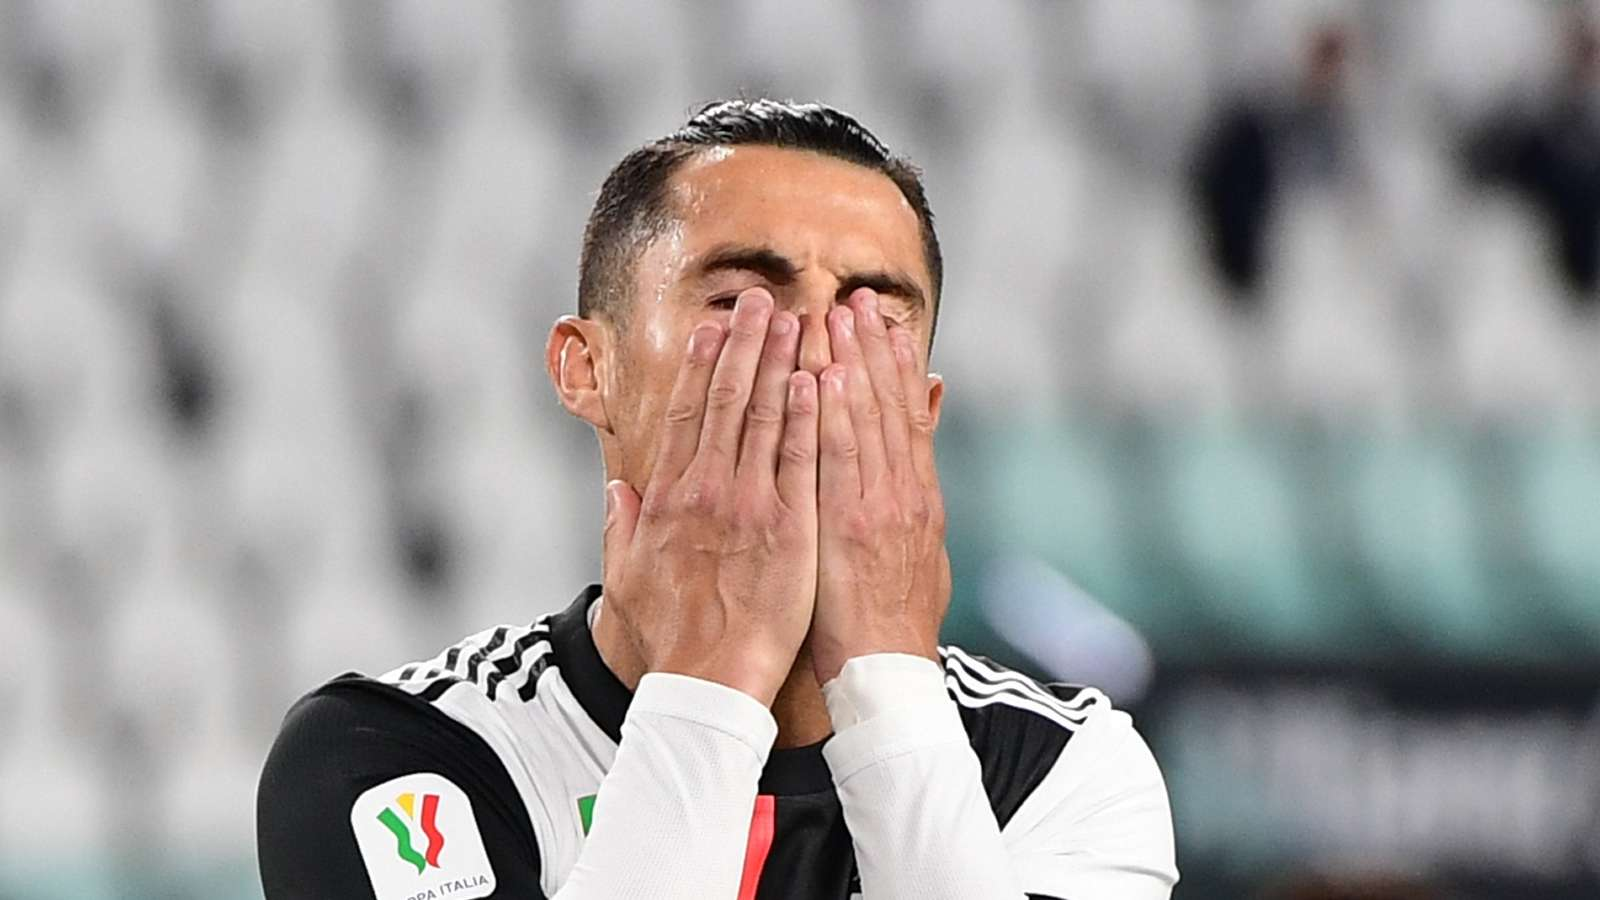 Ronaldo Juve 2020